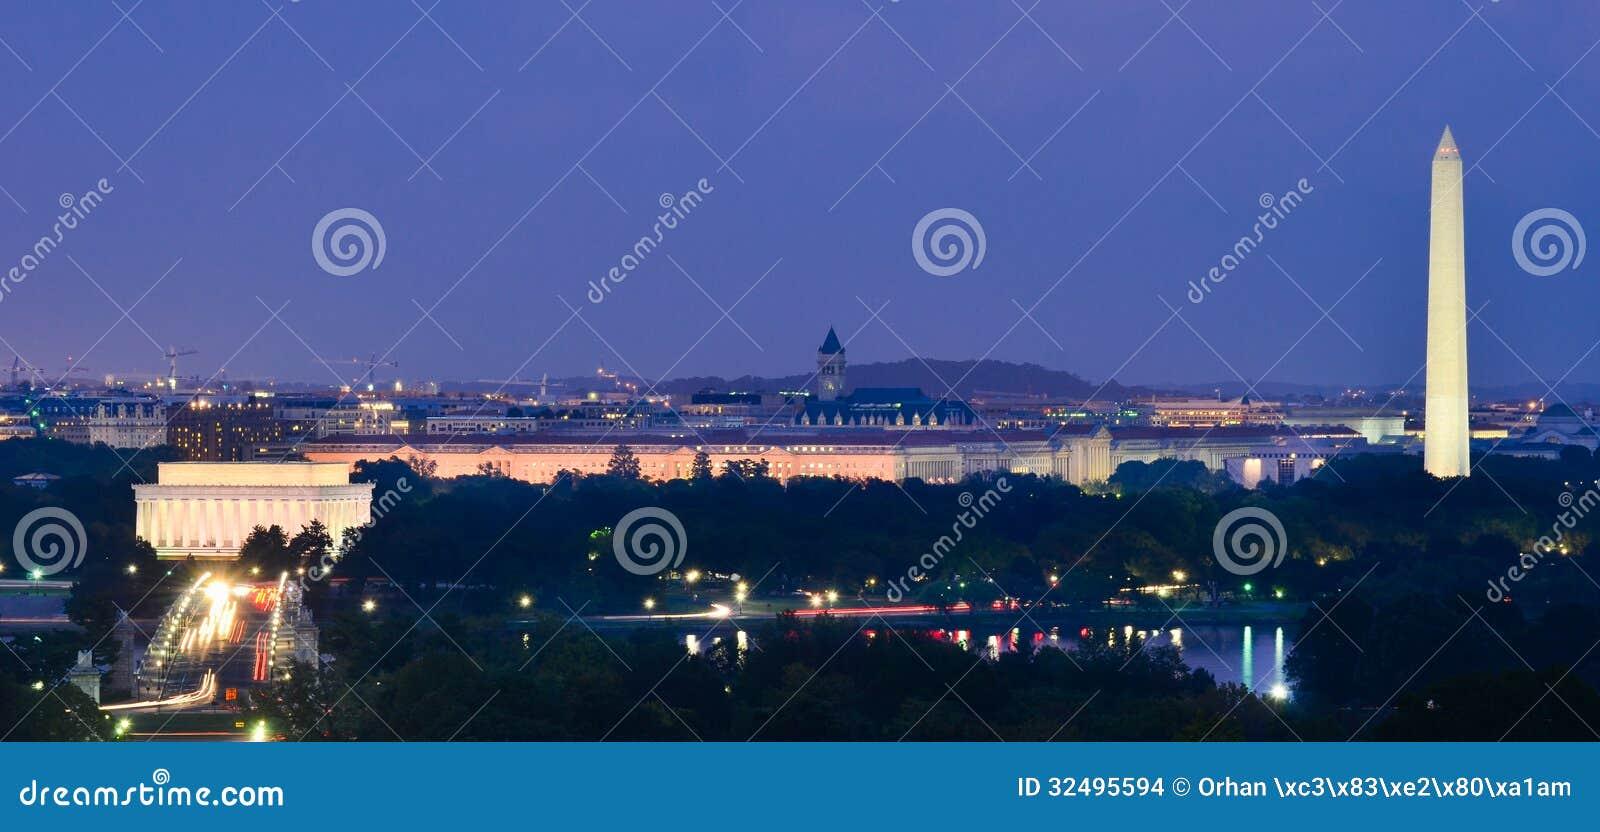 Washington DC skyline at night, including Lincoln Memorial, Washington Monument and Arlington Memorial Bridge